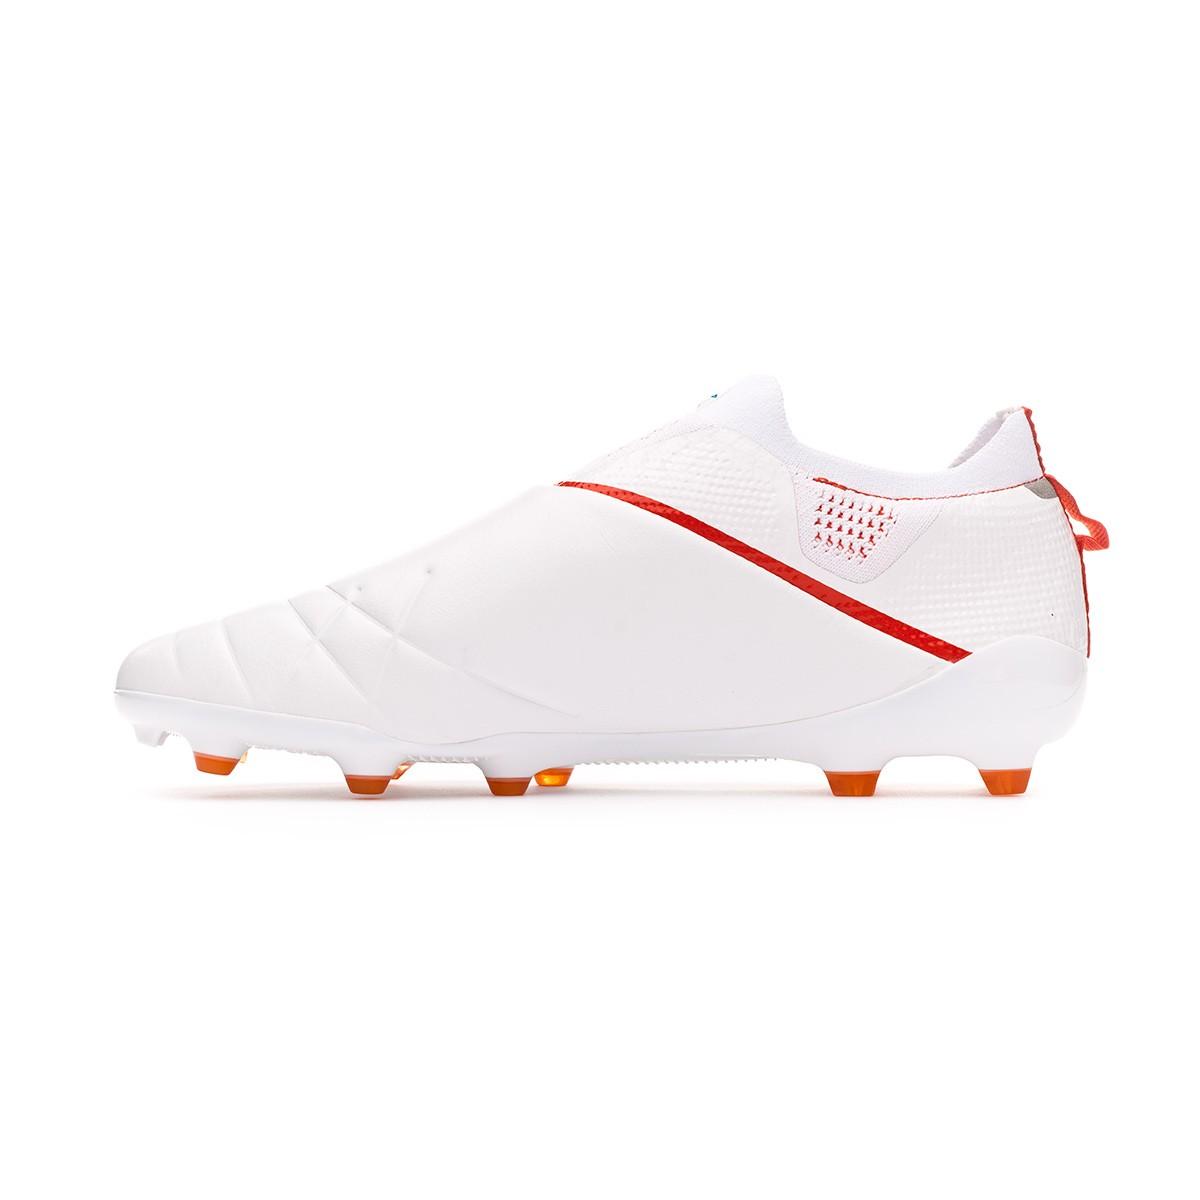 d69a6cdb9e Zapatos de fútbol Umbro Medusae III Elite FG White-Ibiza blue-Cherry tomato  - Tienda de fútbol Fútbol Emotion